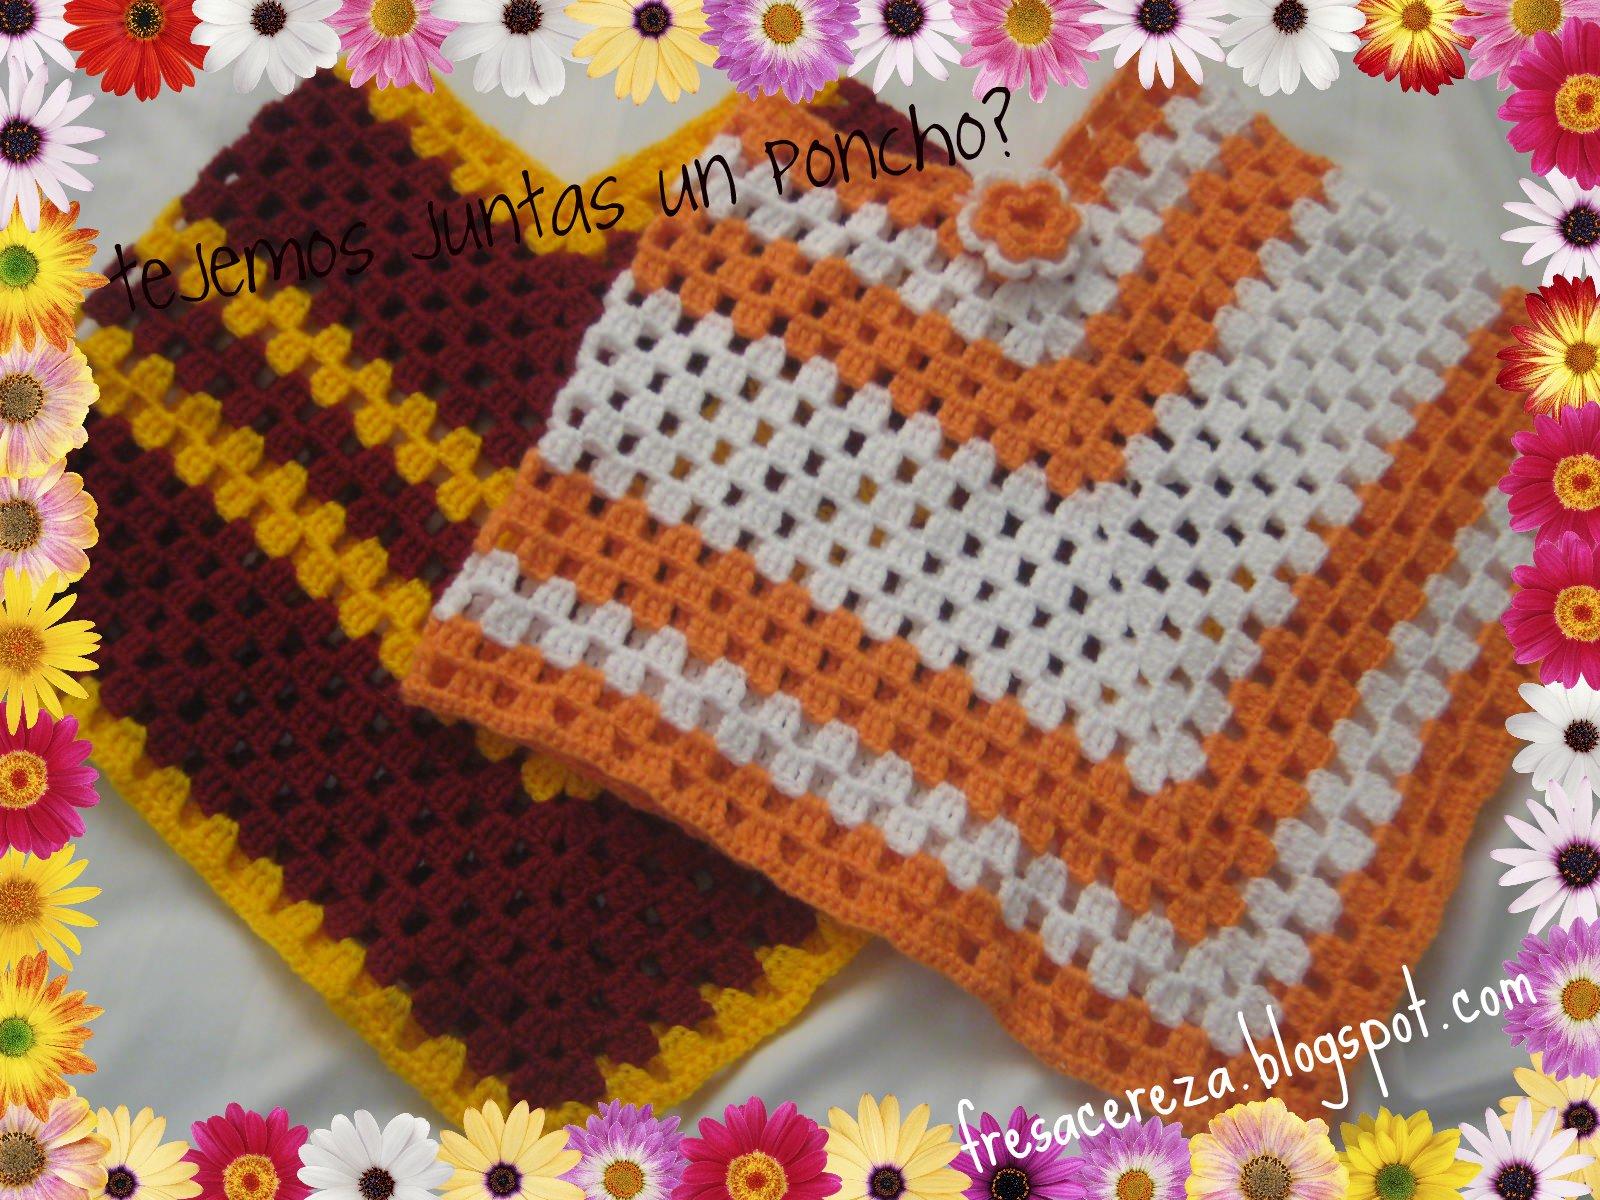 como tejer un poncho a crochet ponchos tejidos tejidos a crochet molde de ponchos con 2. Black Bedroom Furniture Sets. Home Design Ideas